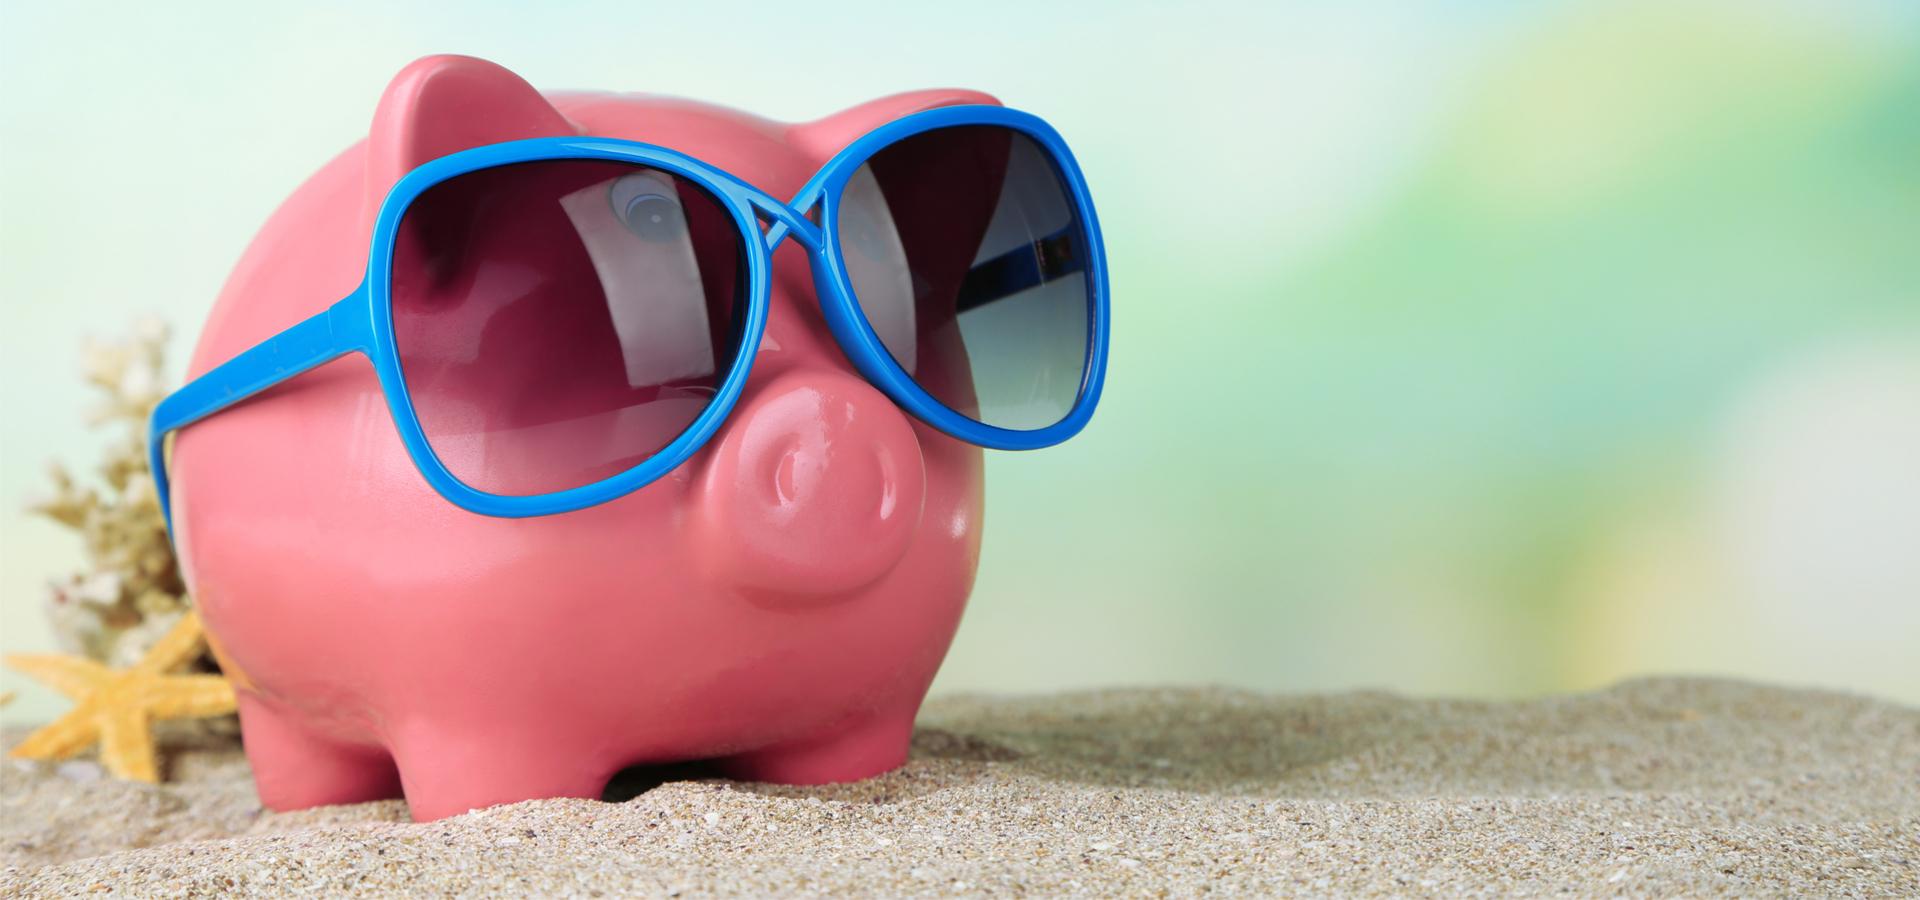 Piggy bank in sunglassess on beach